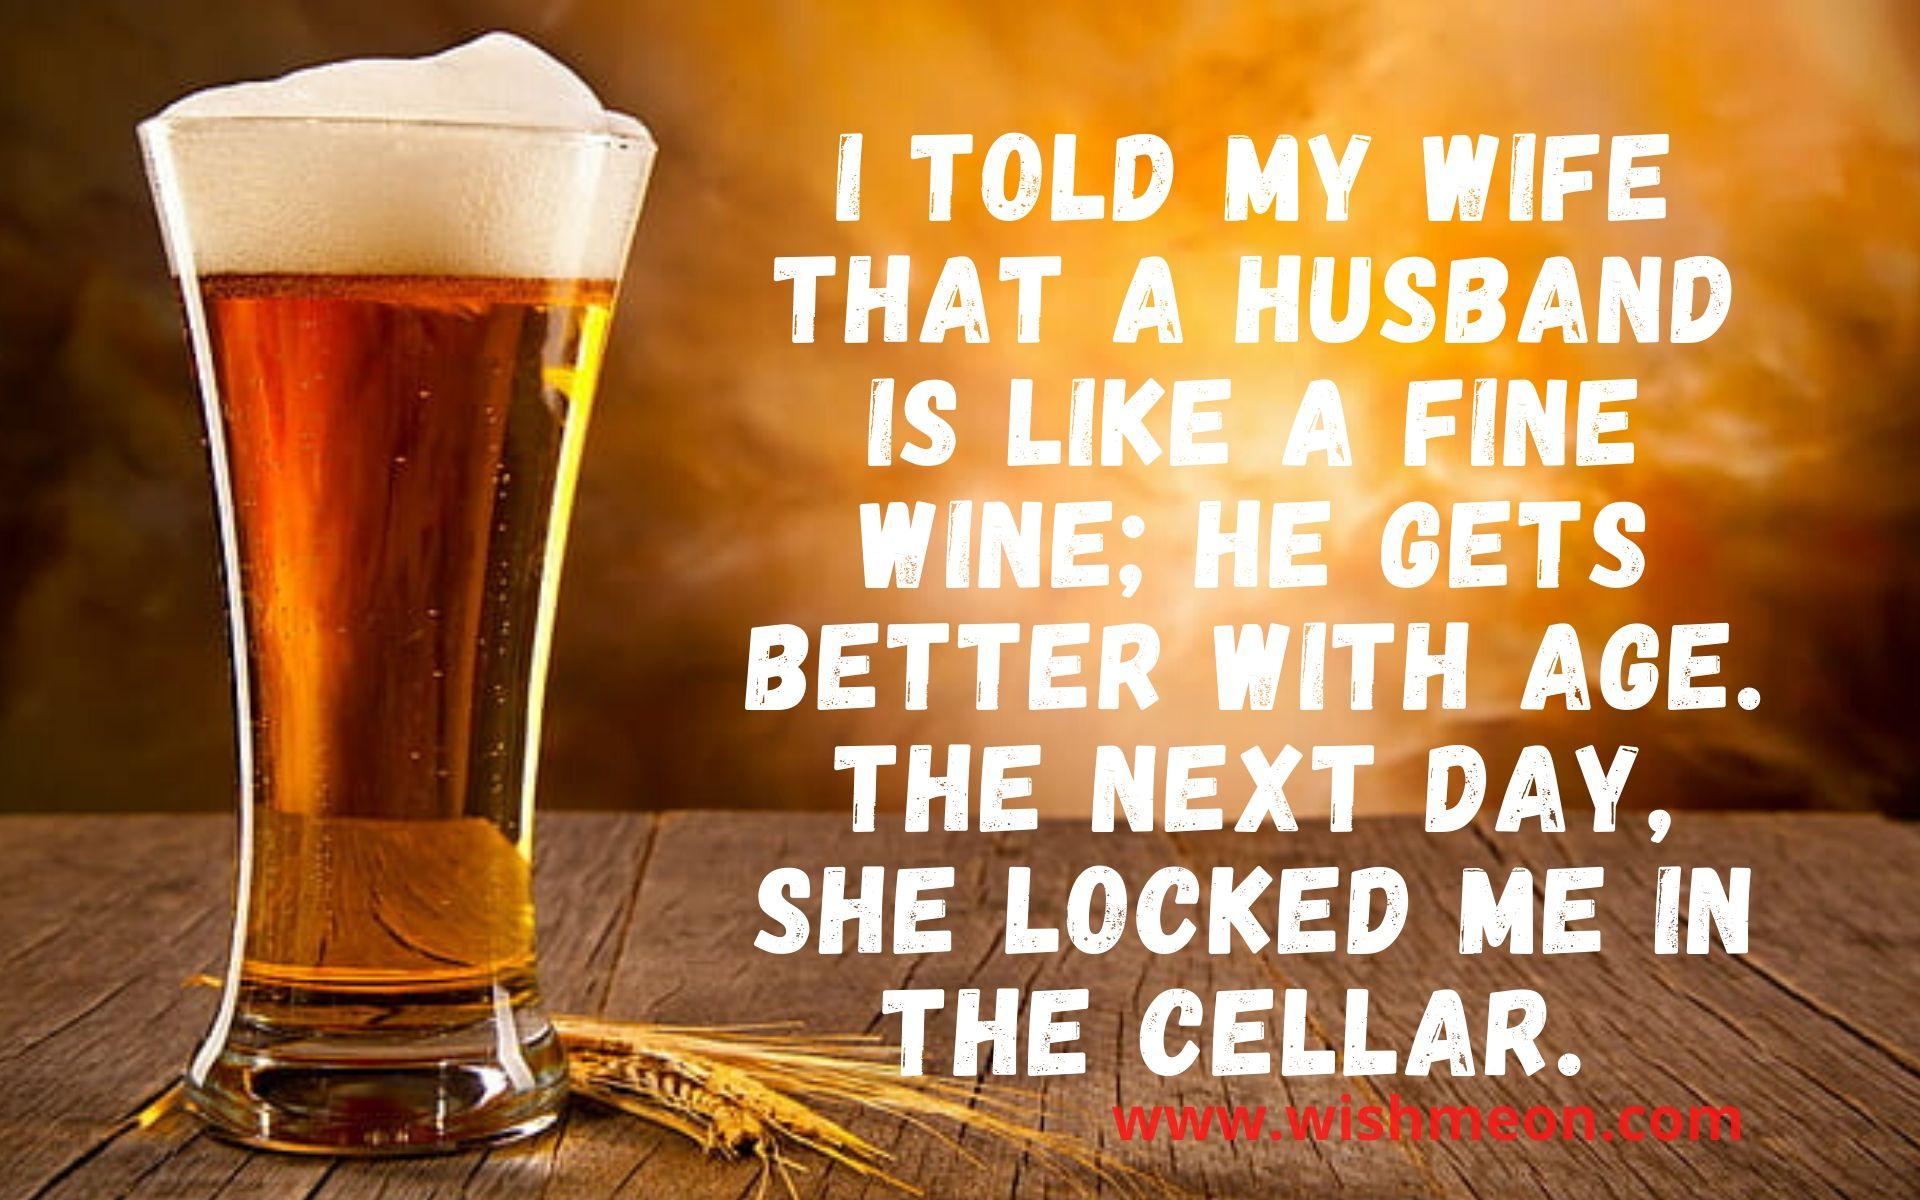 I Told My Wife That A Husband Is Like A Fine Wine